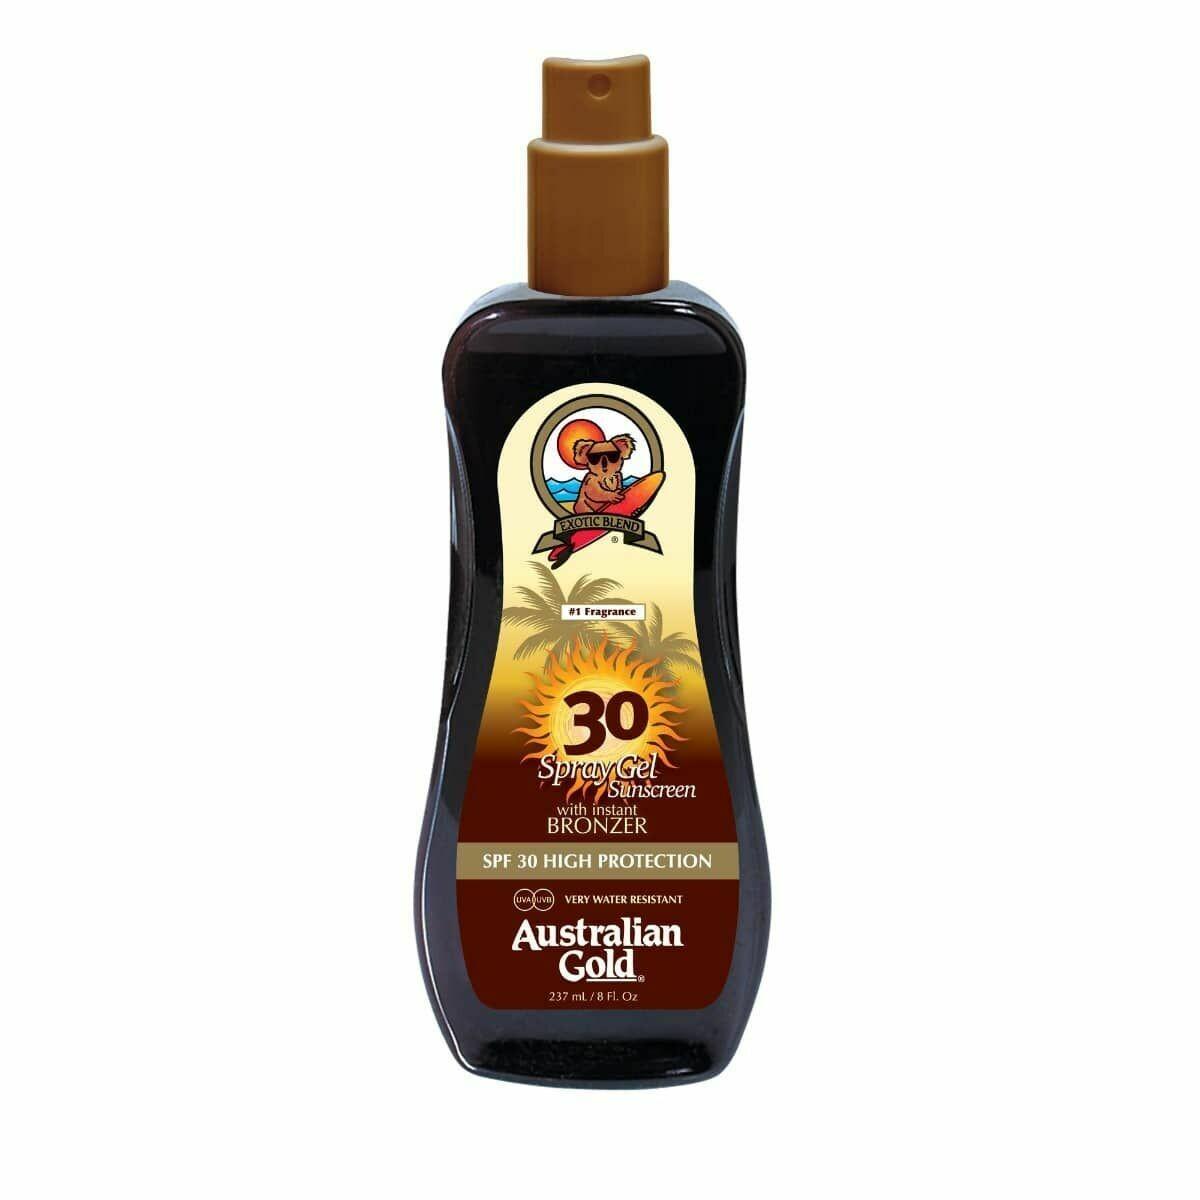 Australian Gold Spf 30 Spray Gel with Bronzer 237ml - Cocoa Dreams